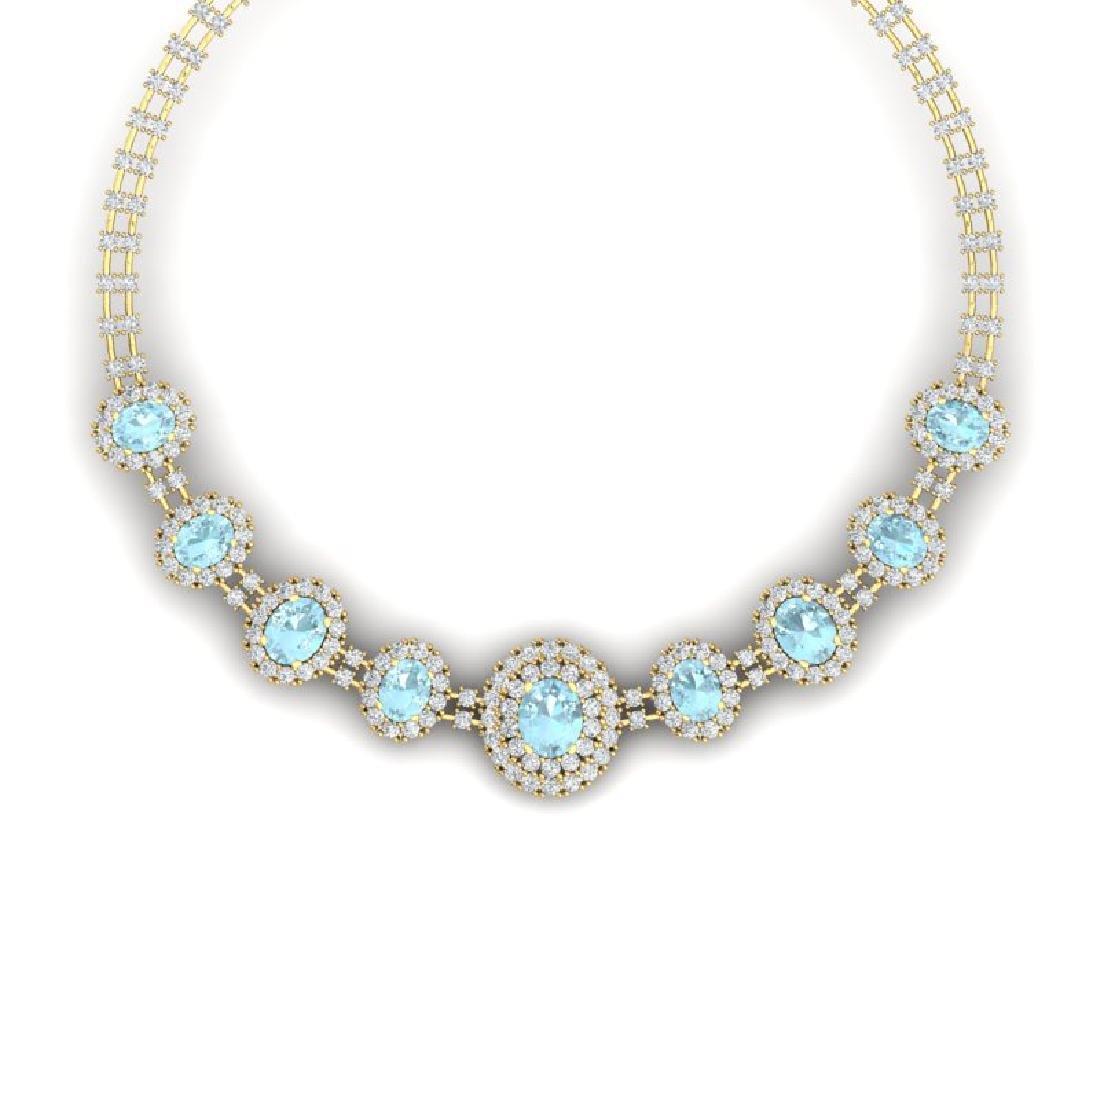 47.10 CTW Royalty Sky Topaz & VS Diamond Necklace 18K